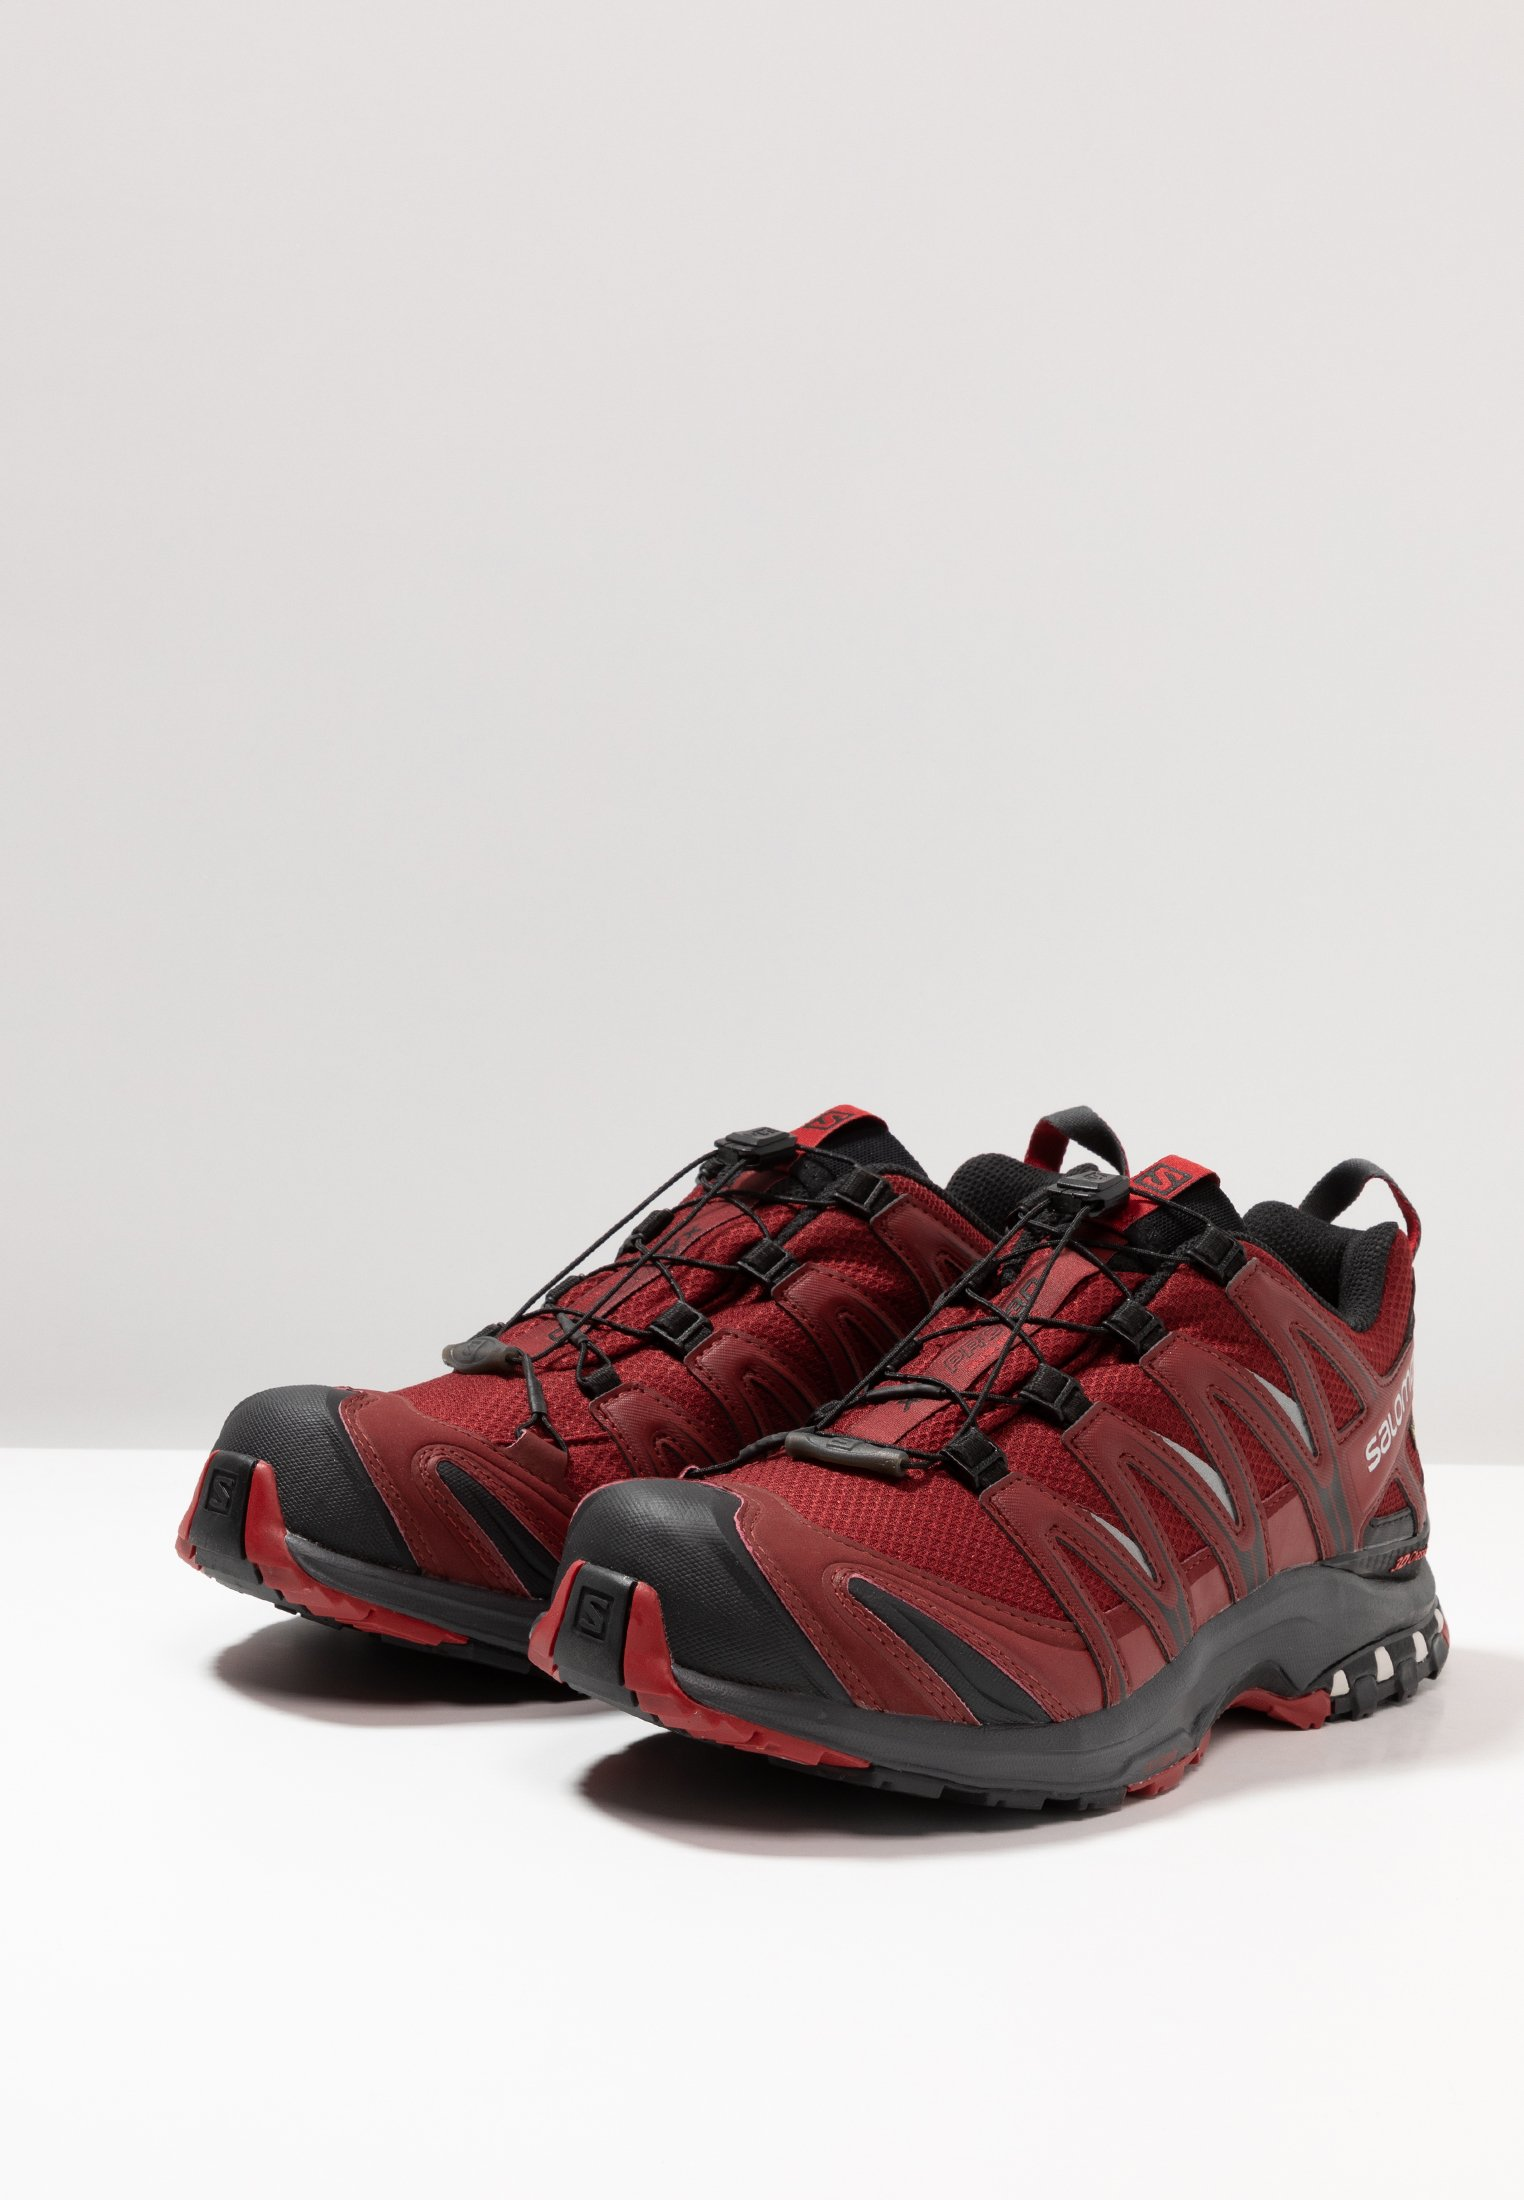 salomon xa pro 3d ultra 2 gtx red black sport